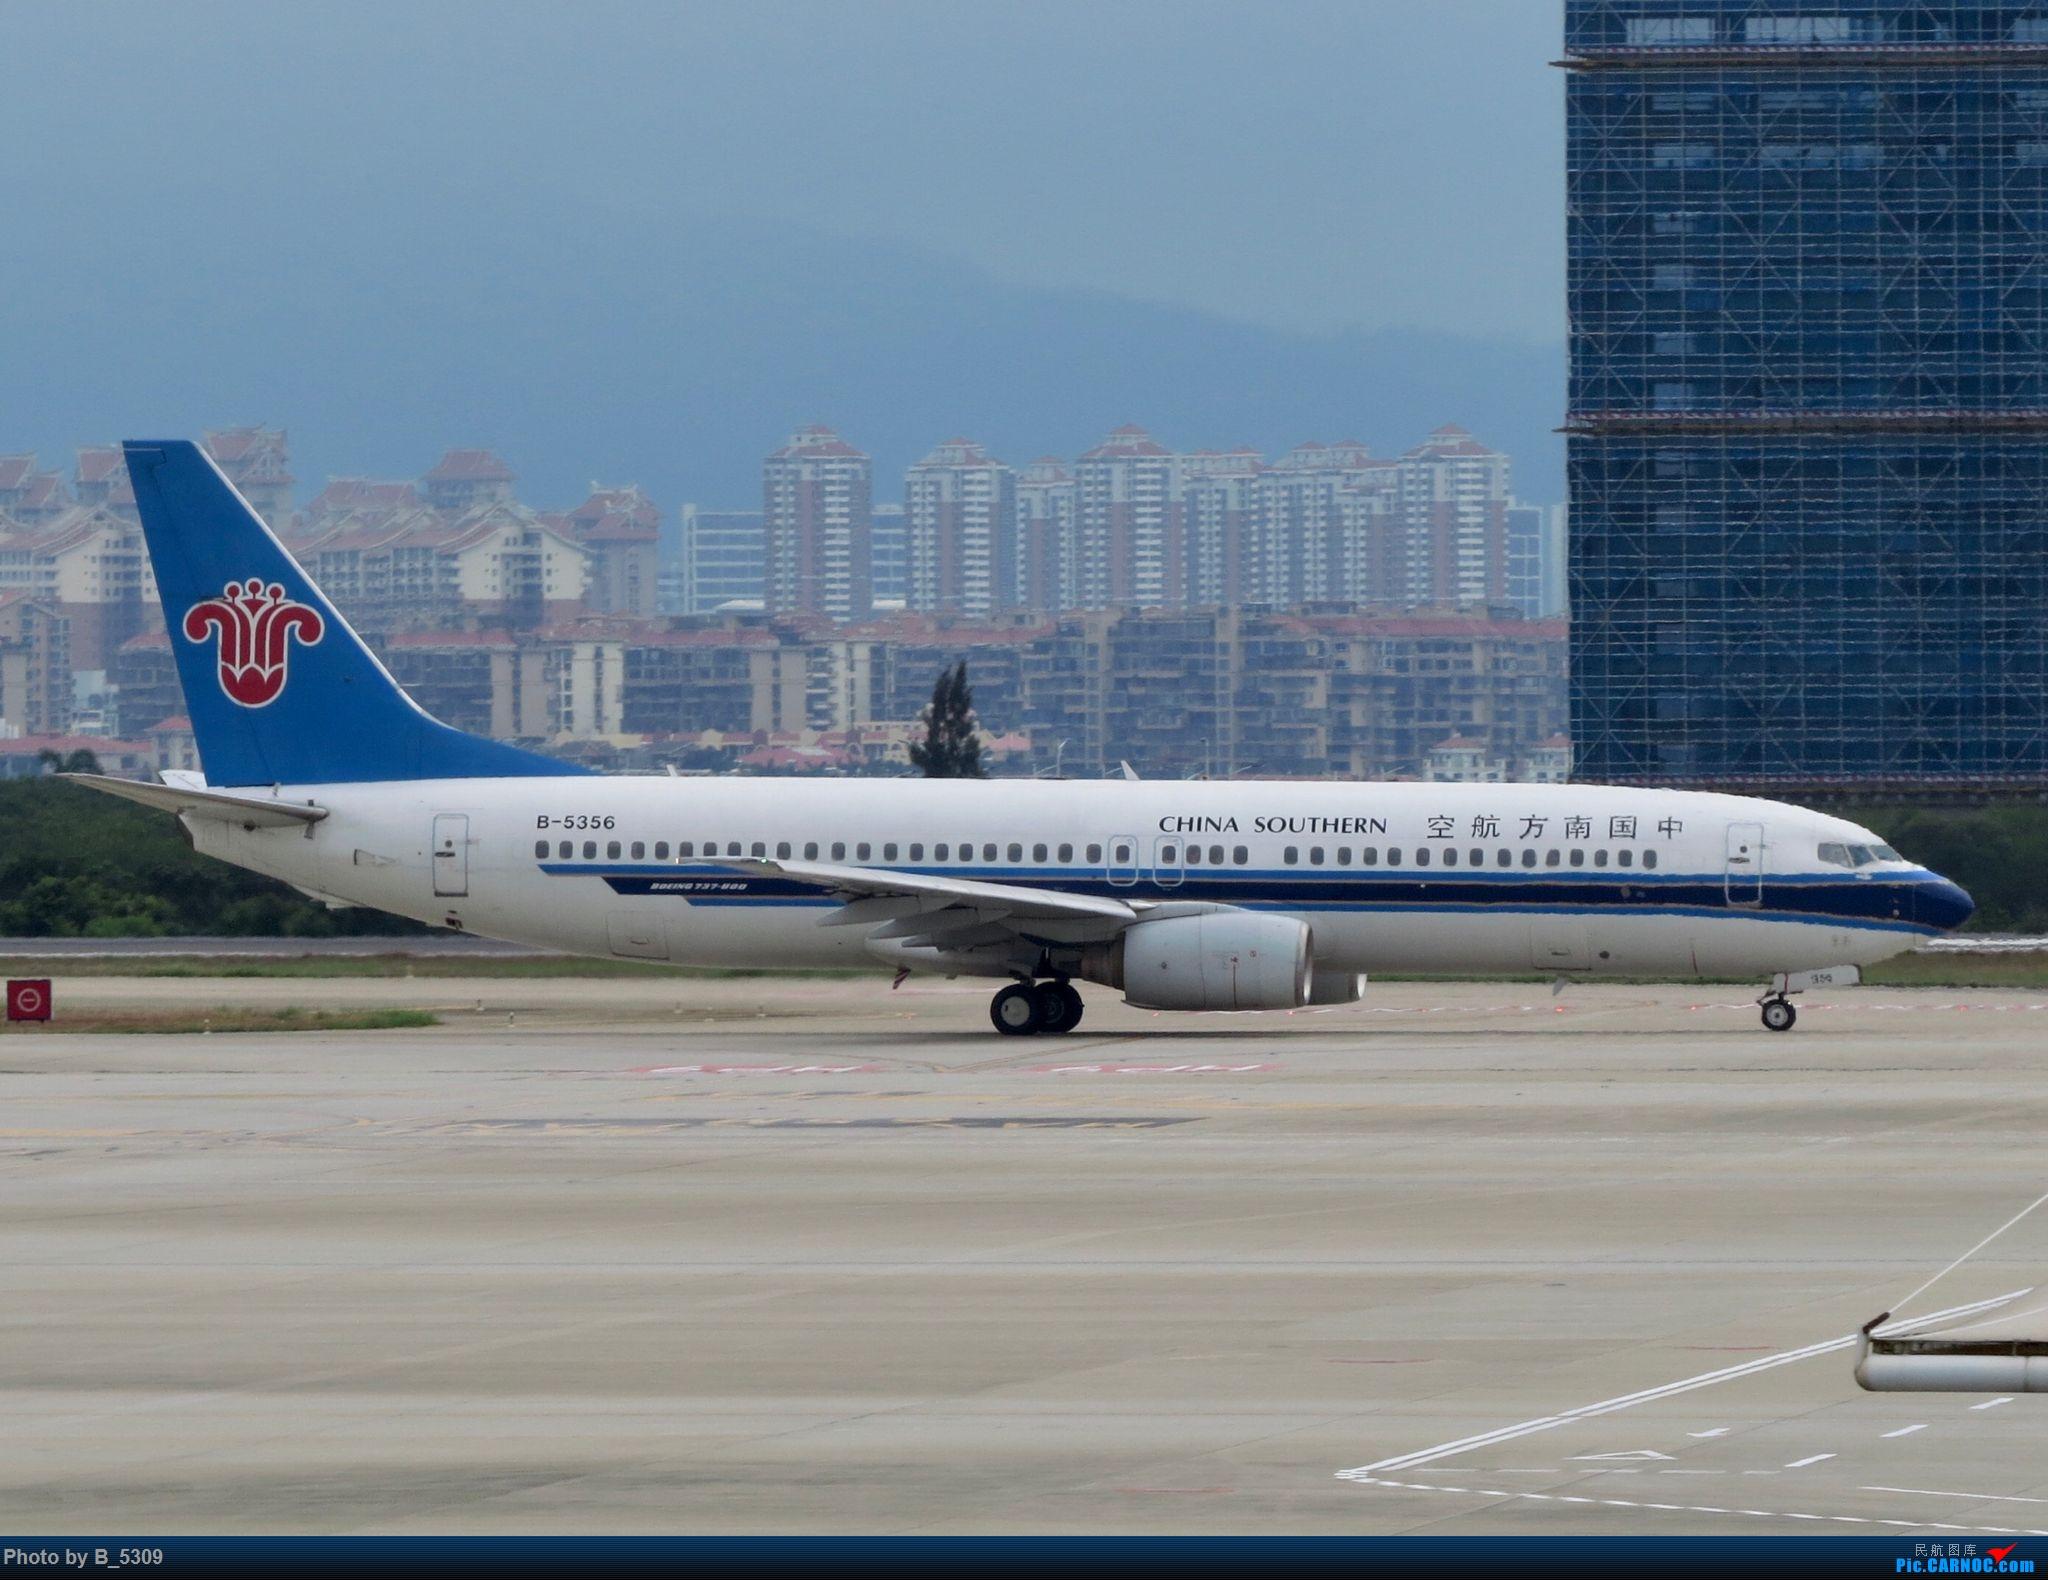 Re:[原创]复课一个月了,终于能在紧张的学习生活中抽出点时间拍稽~ BOEING 737-800 B-5356 中国厦门高崎国际机场